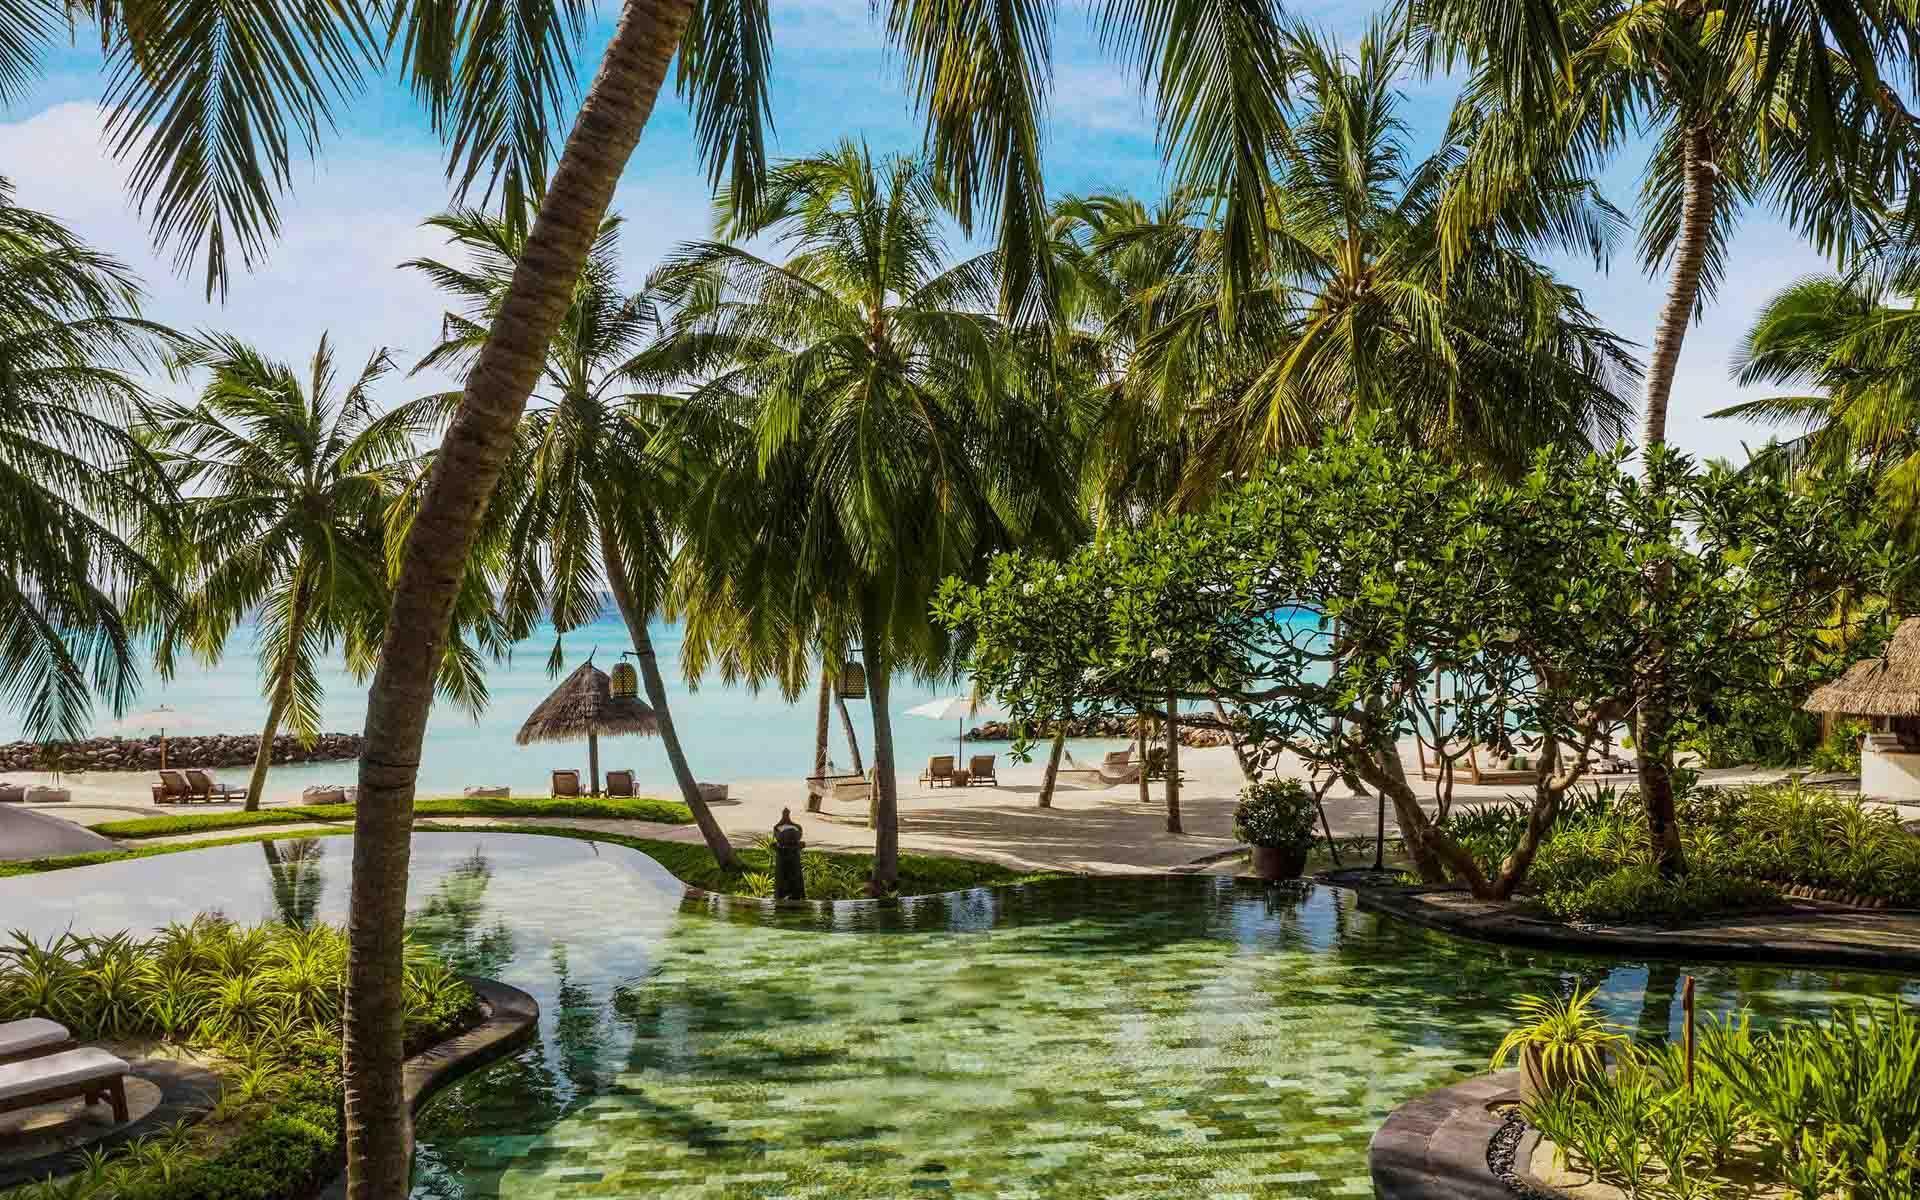 La piscine lagon du One&Only Reethi Rah © DR